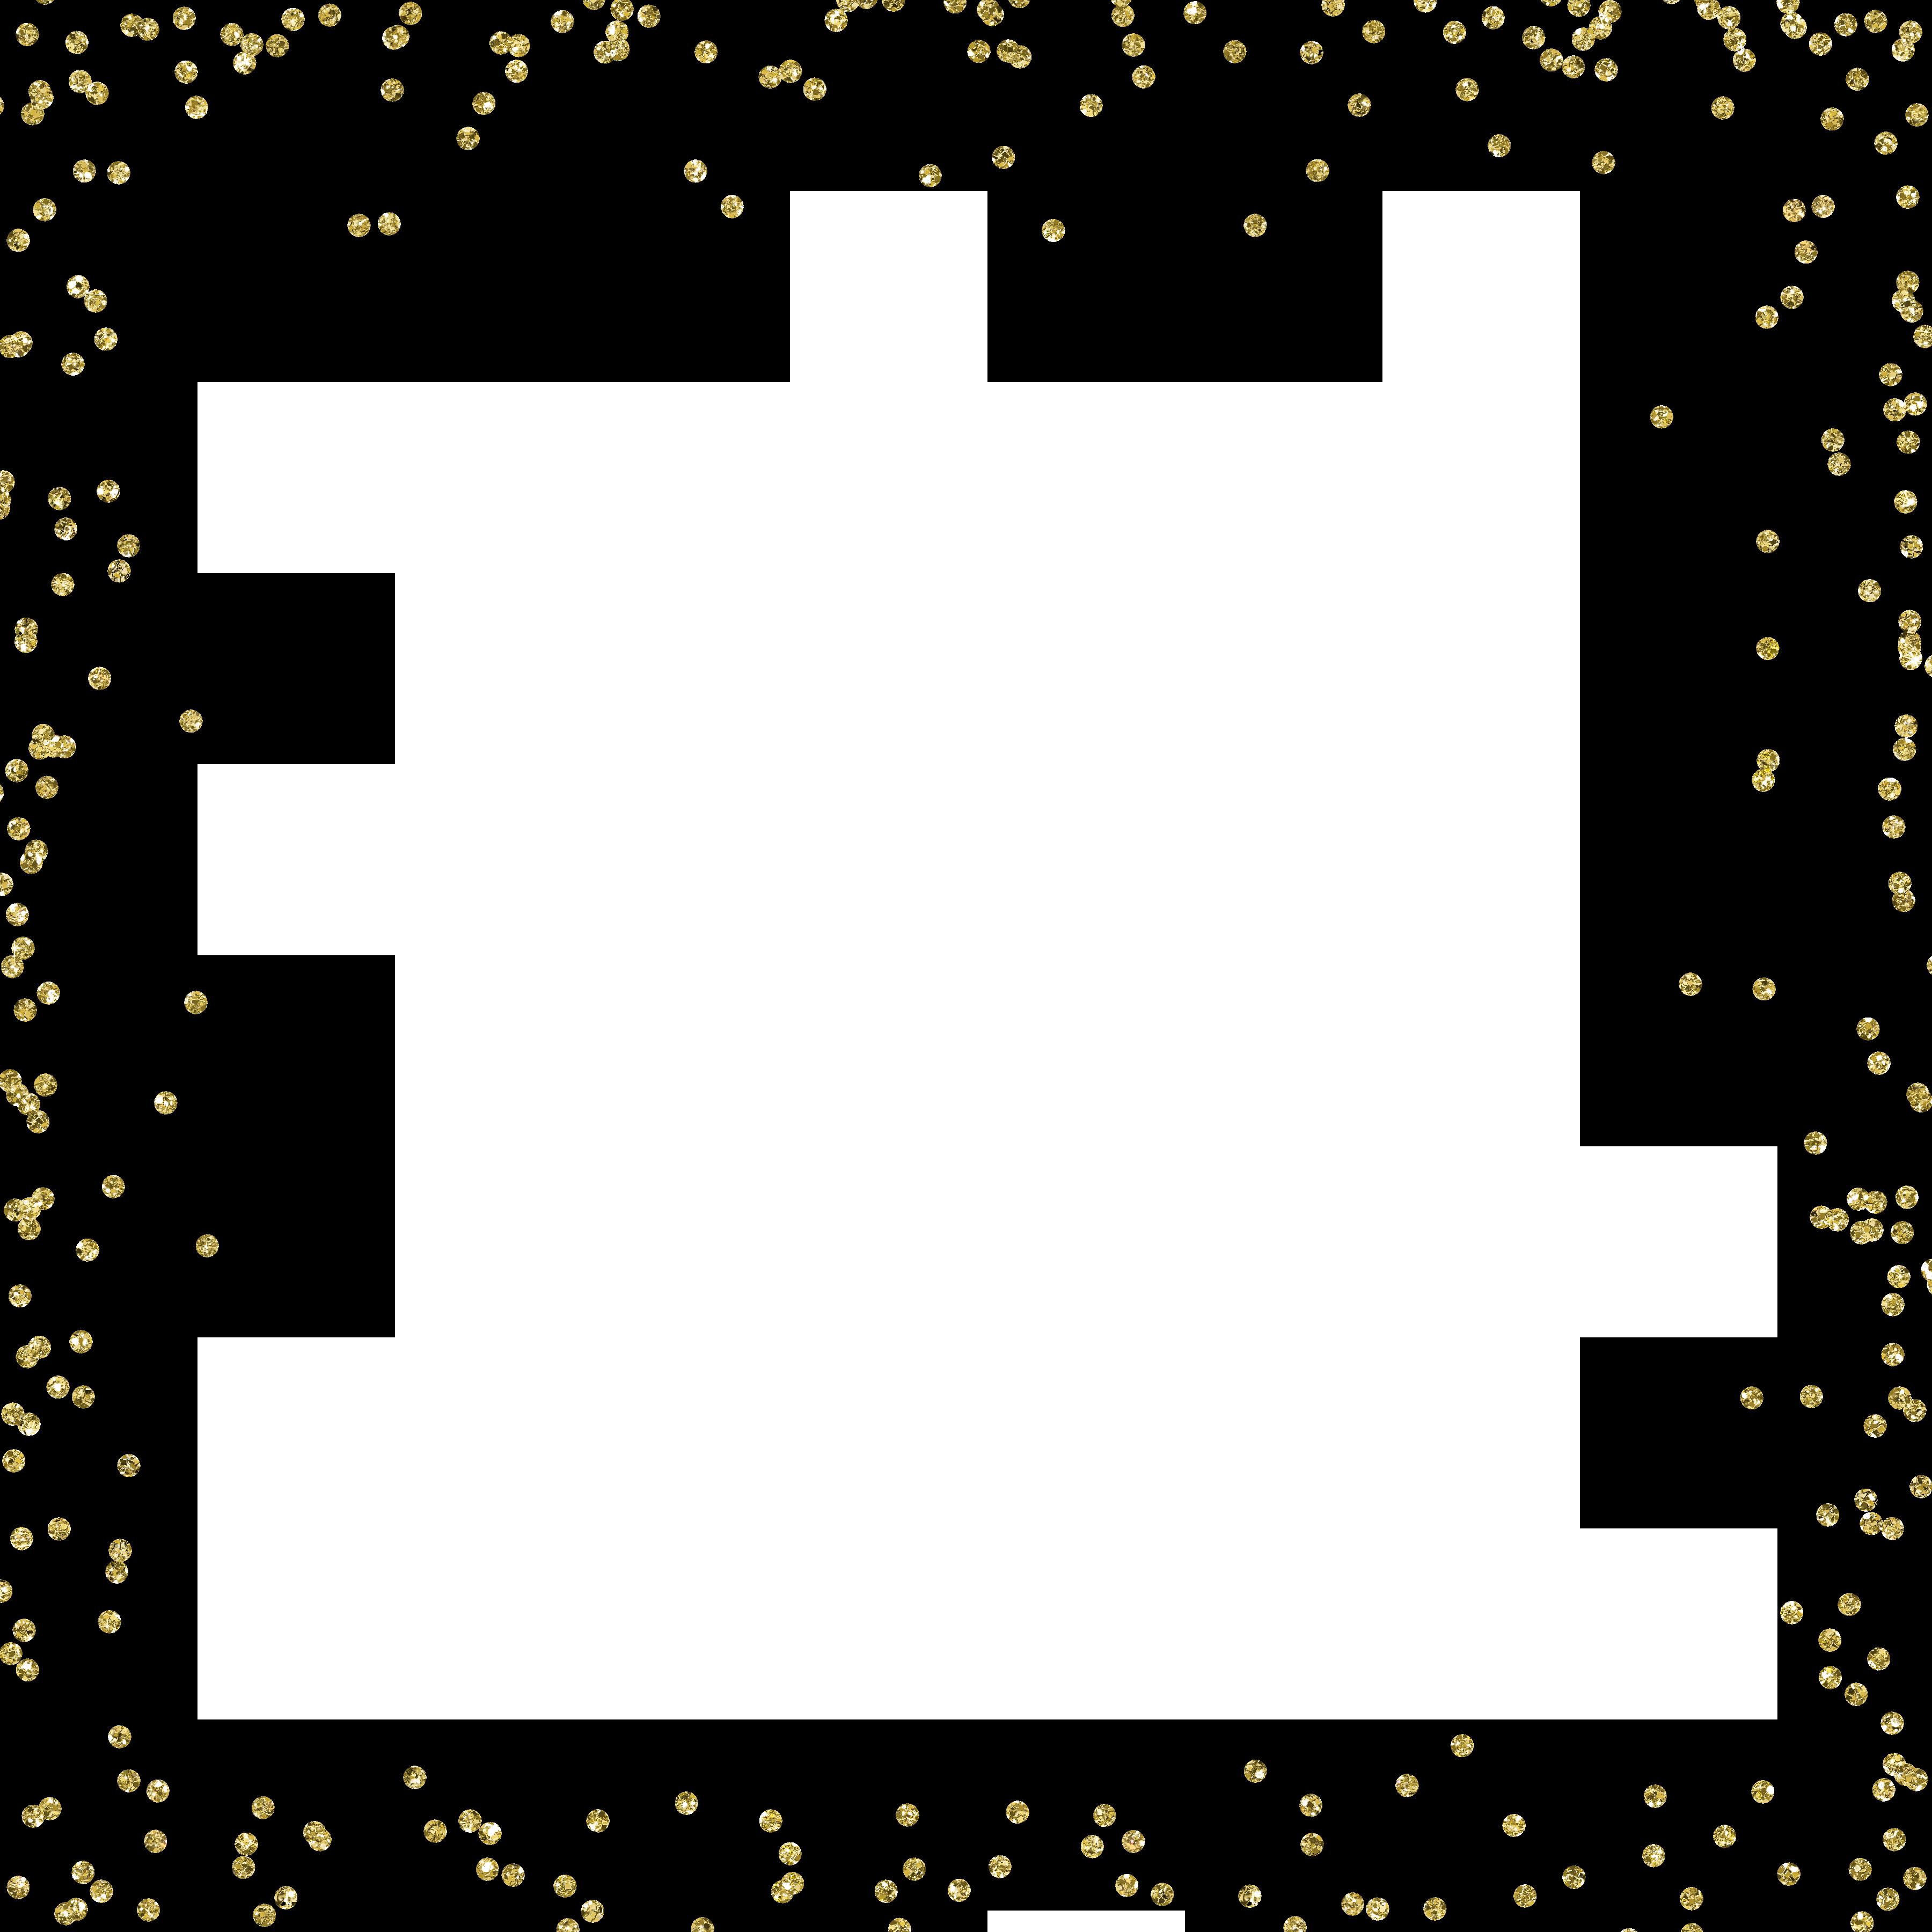 Gold Glitter Border Gold Border Border Templates Invitation Frames